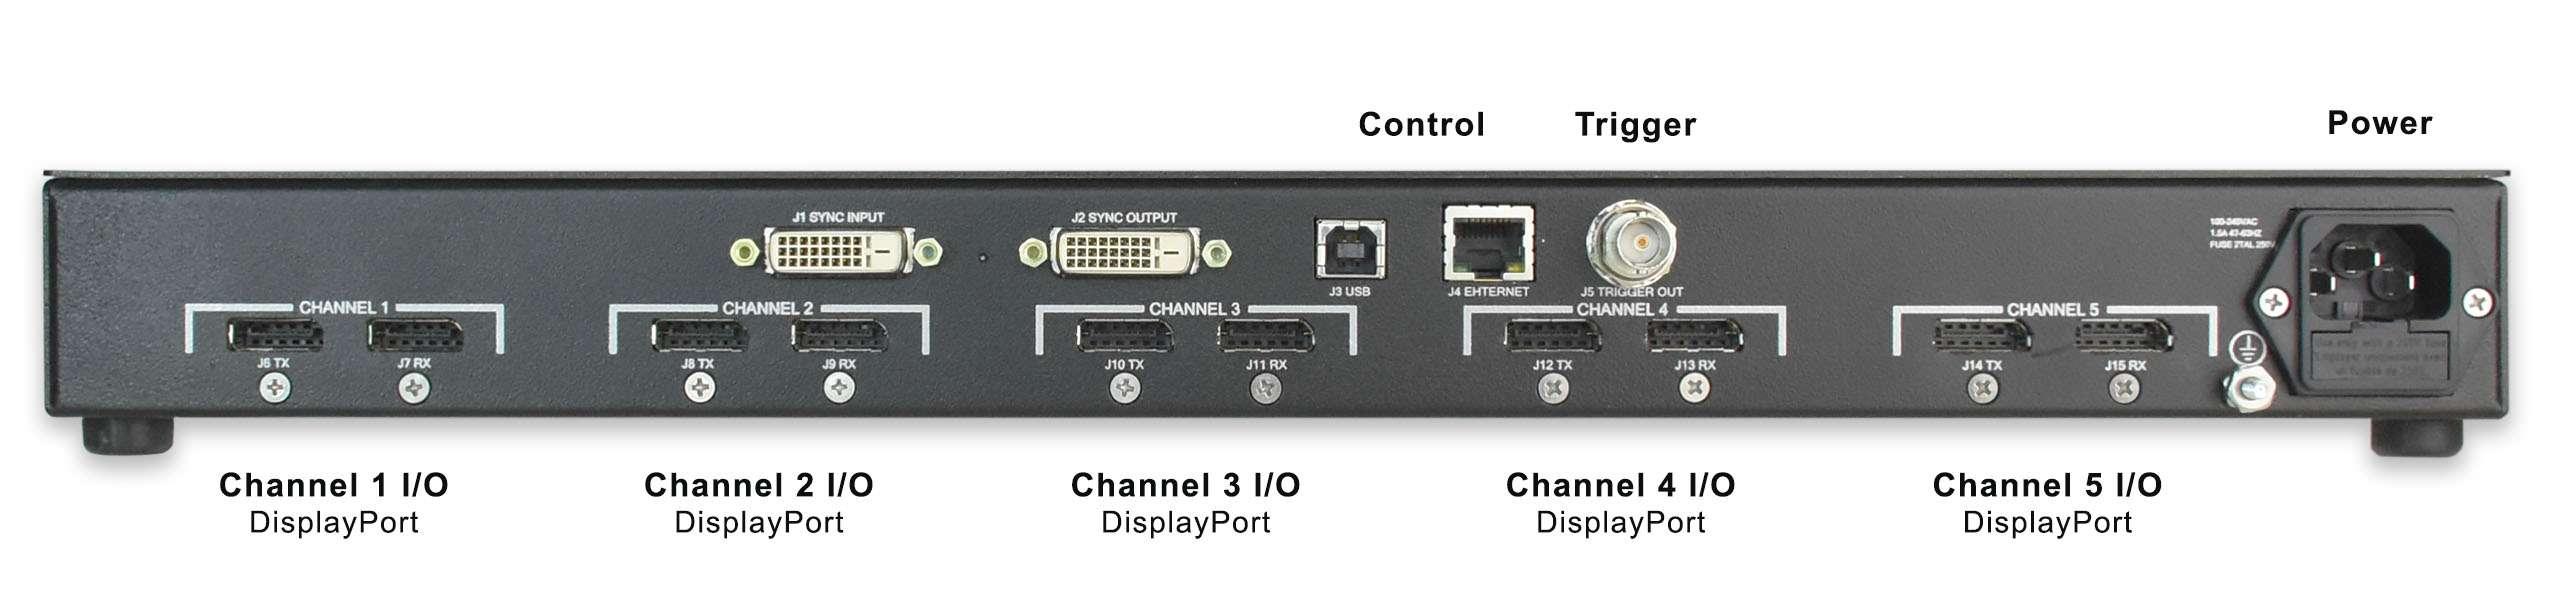 Image warp processor - Warper4K Connectors View